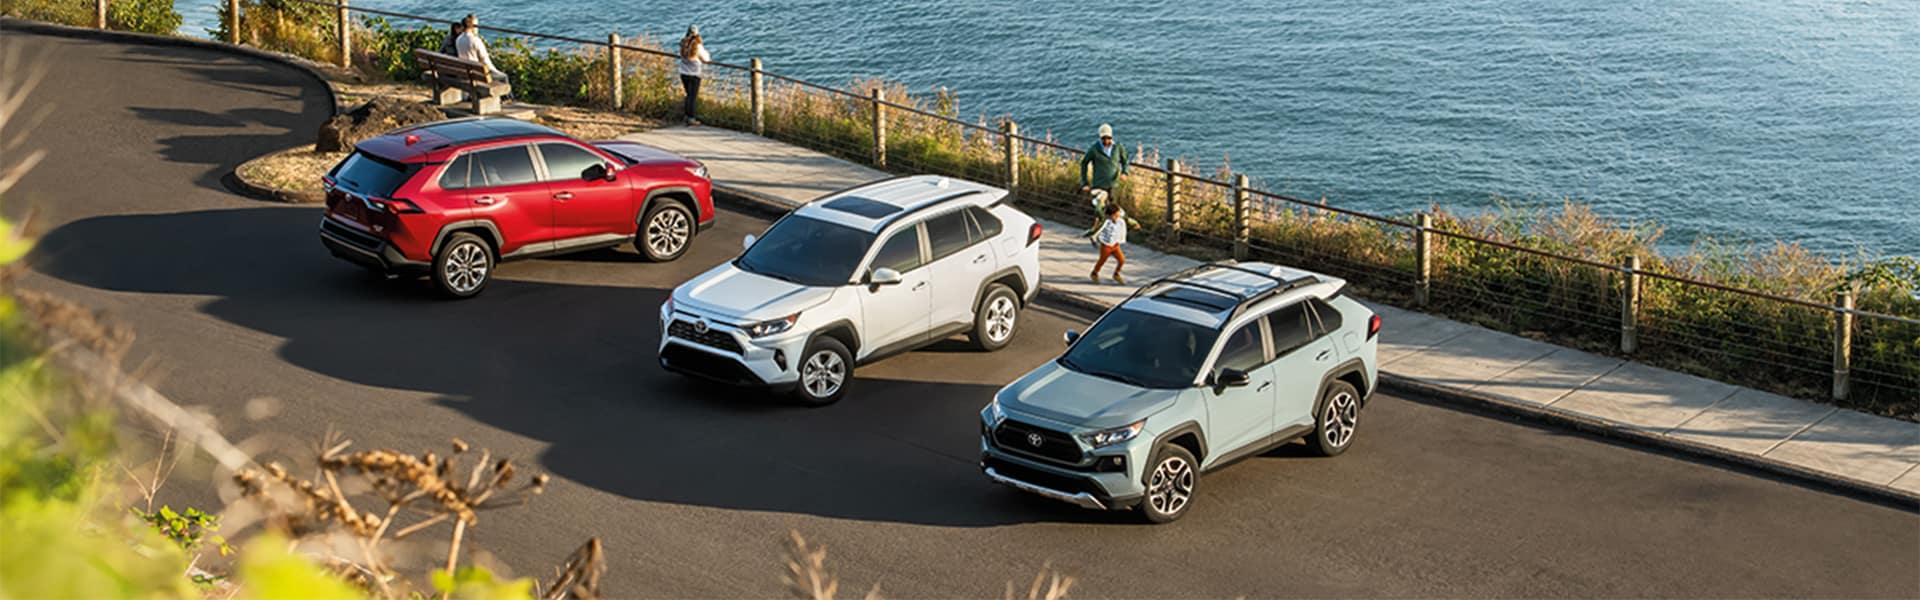 Halterman's Toyota is a Toyota Dealership near Cresco, PA   Three RAV4s Parked Next to the Beach